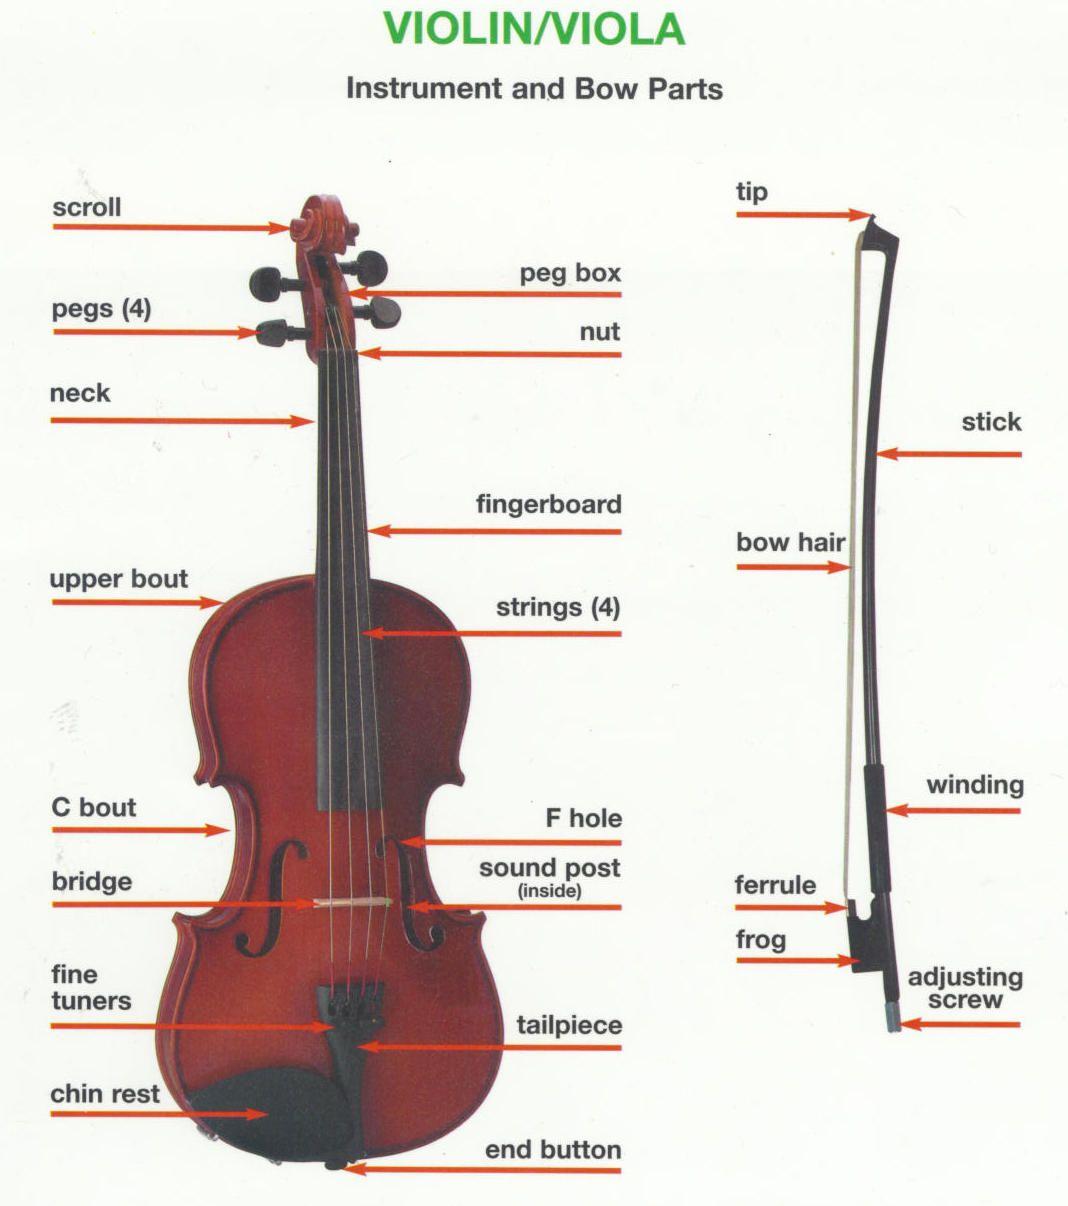 Parts Of The Violin Worksheet